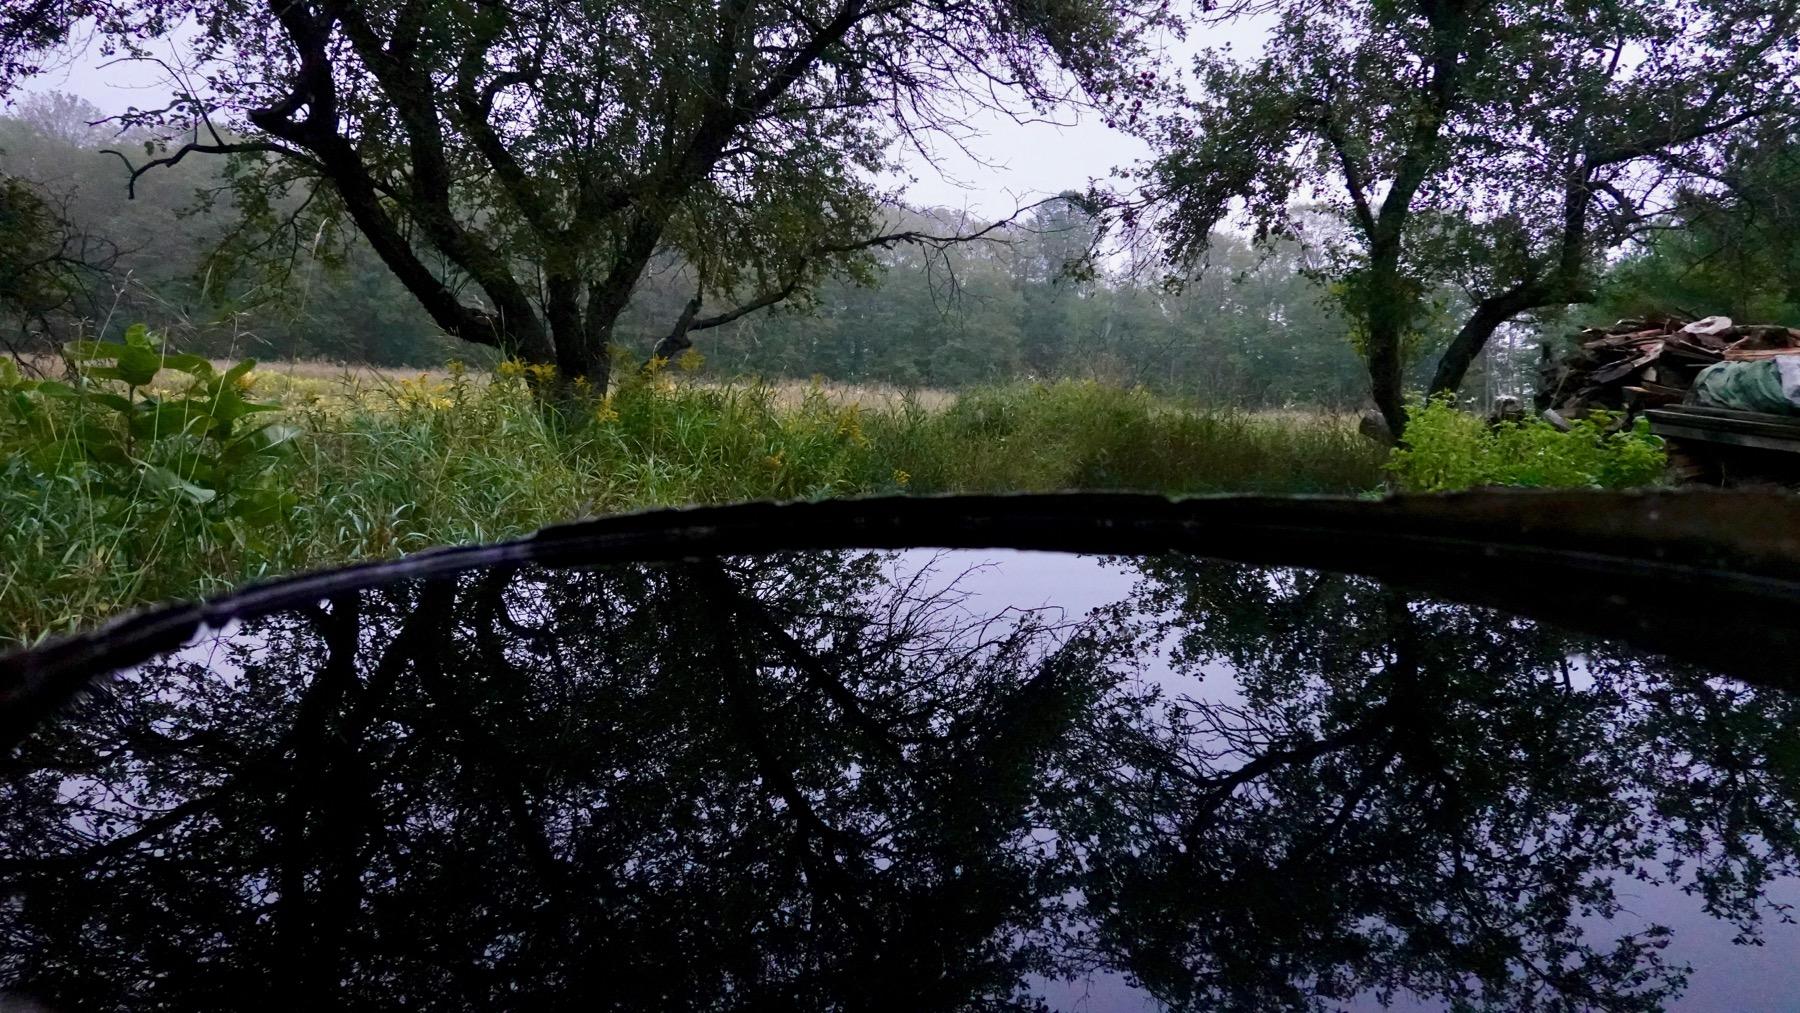 Waterbarrel reflection